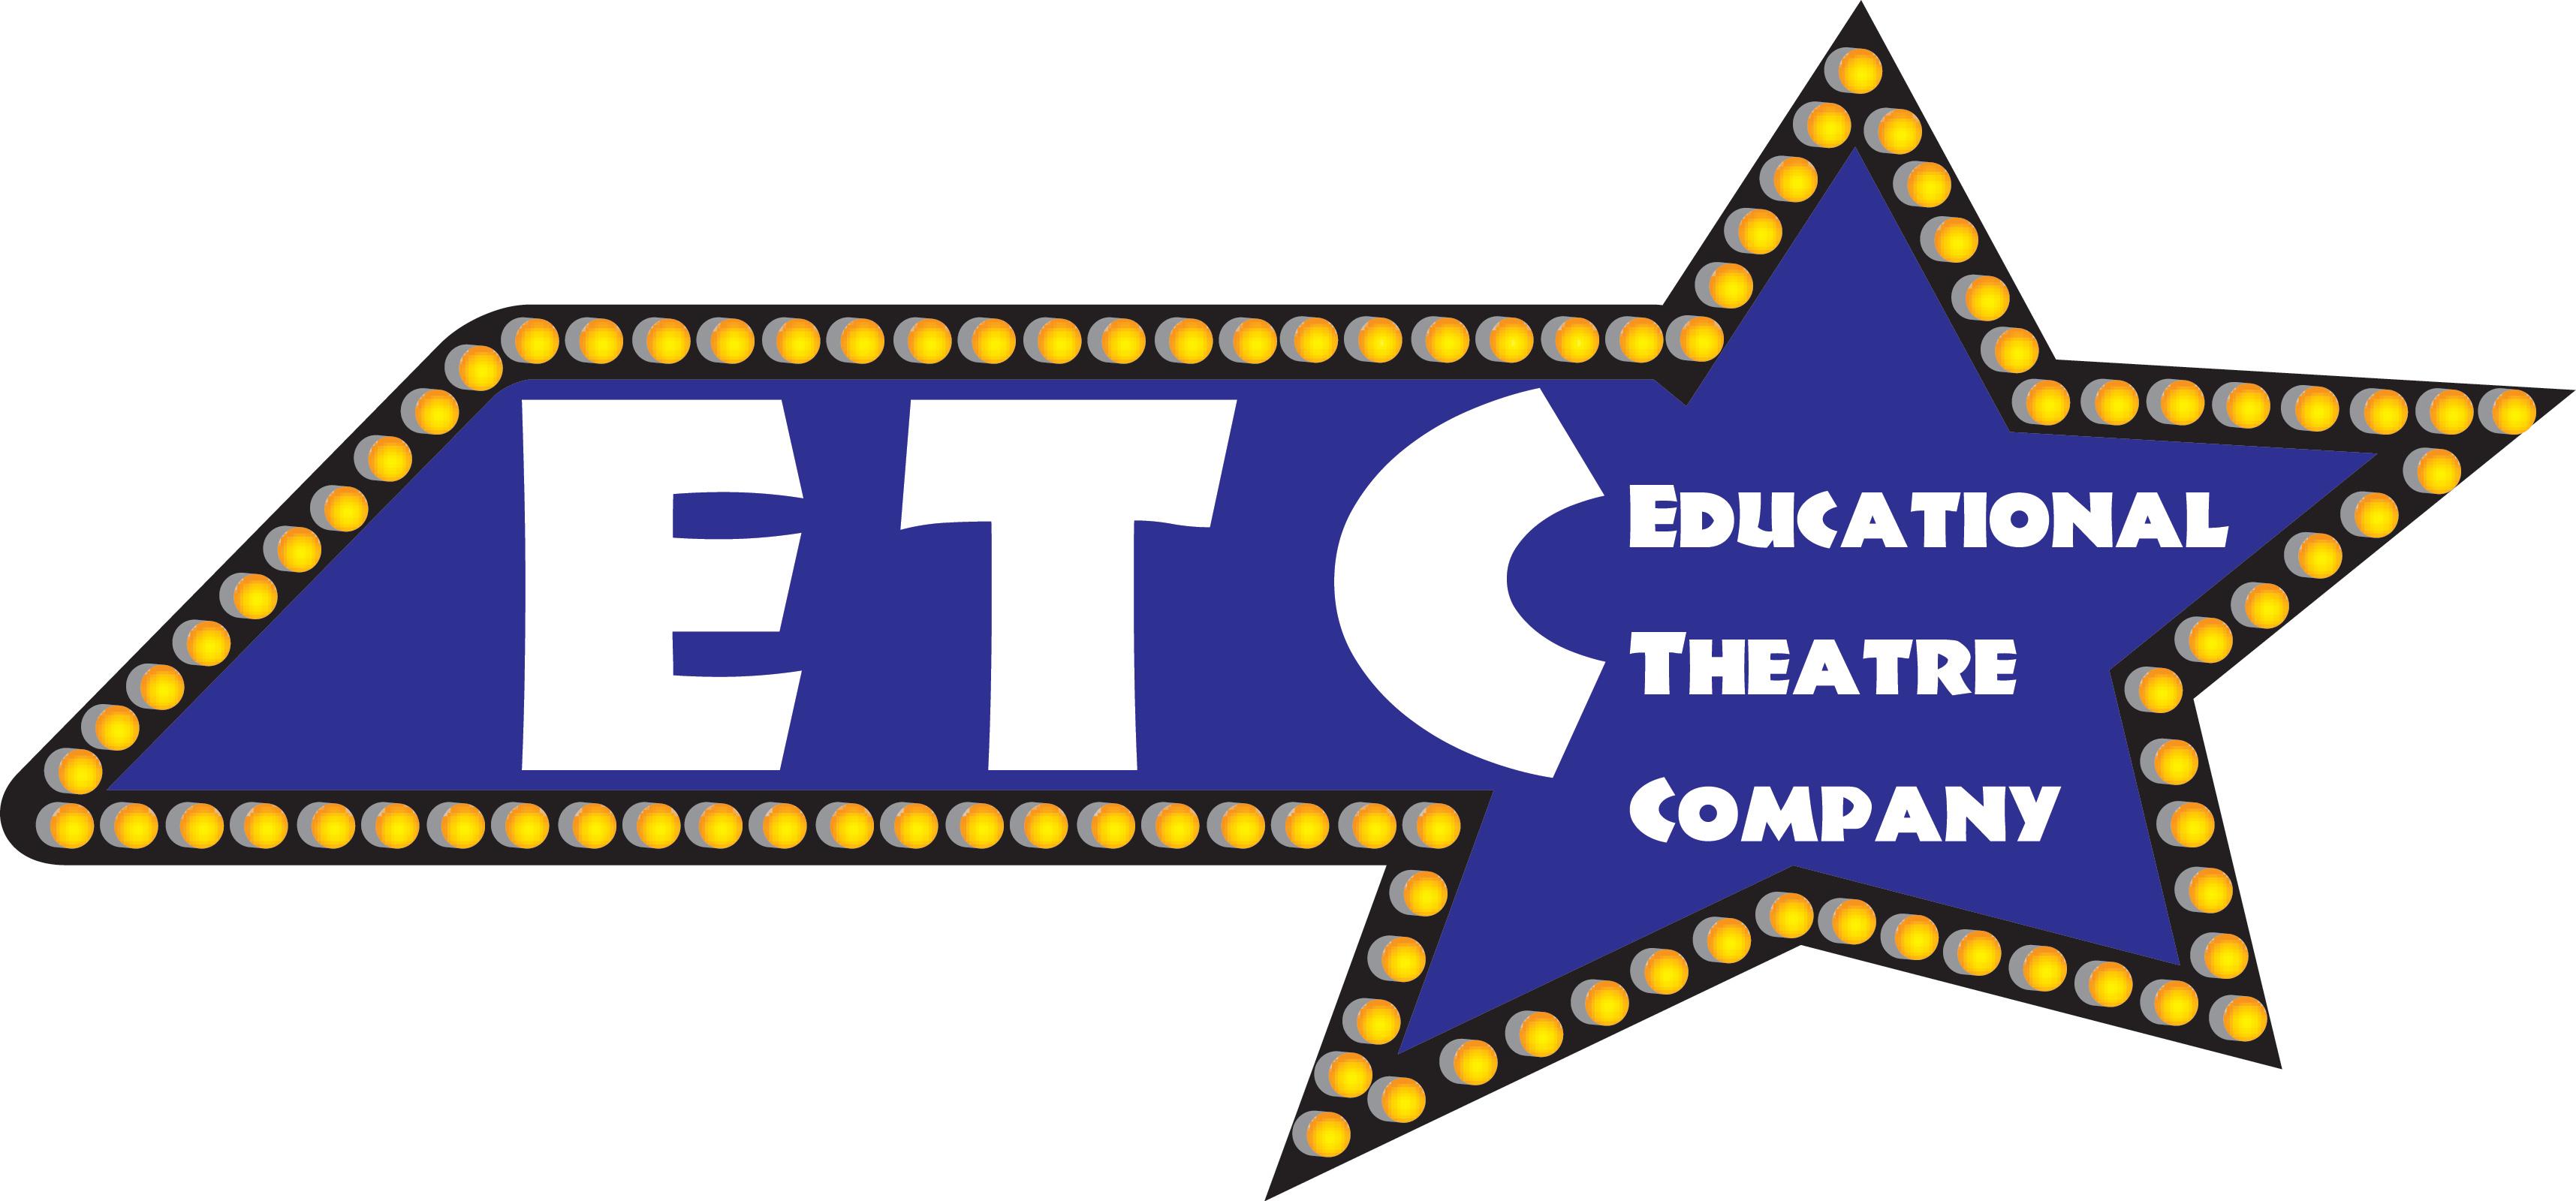 Educational Theatre Logo